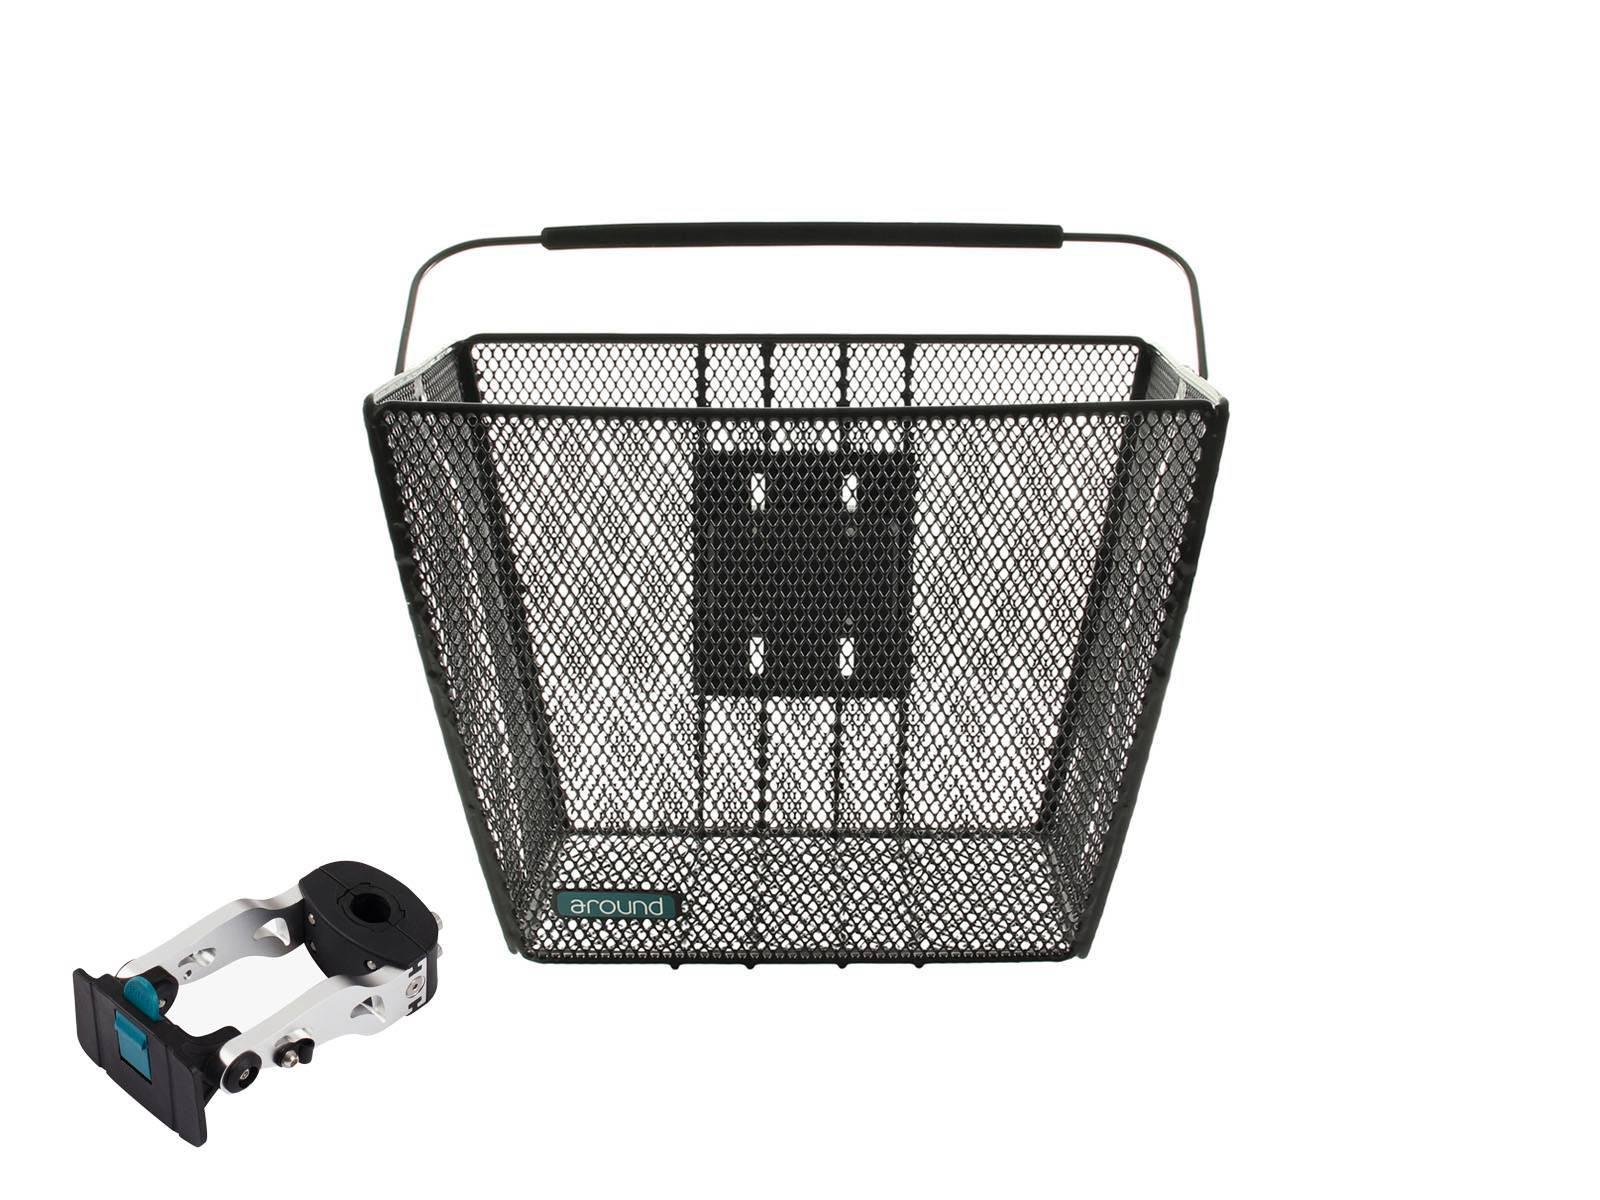 around fahrradkorb vorne ace lenkerrohrhalter sch fahrradkomfort. Black Bedroom Furniture Sets. Home Design Ideas